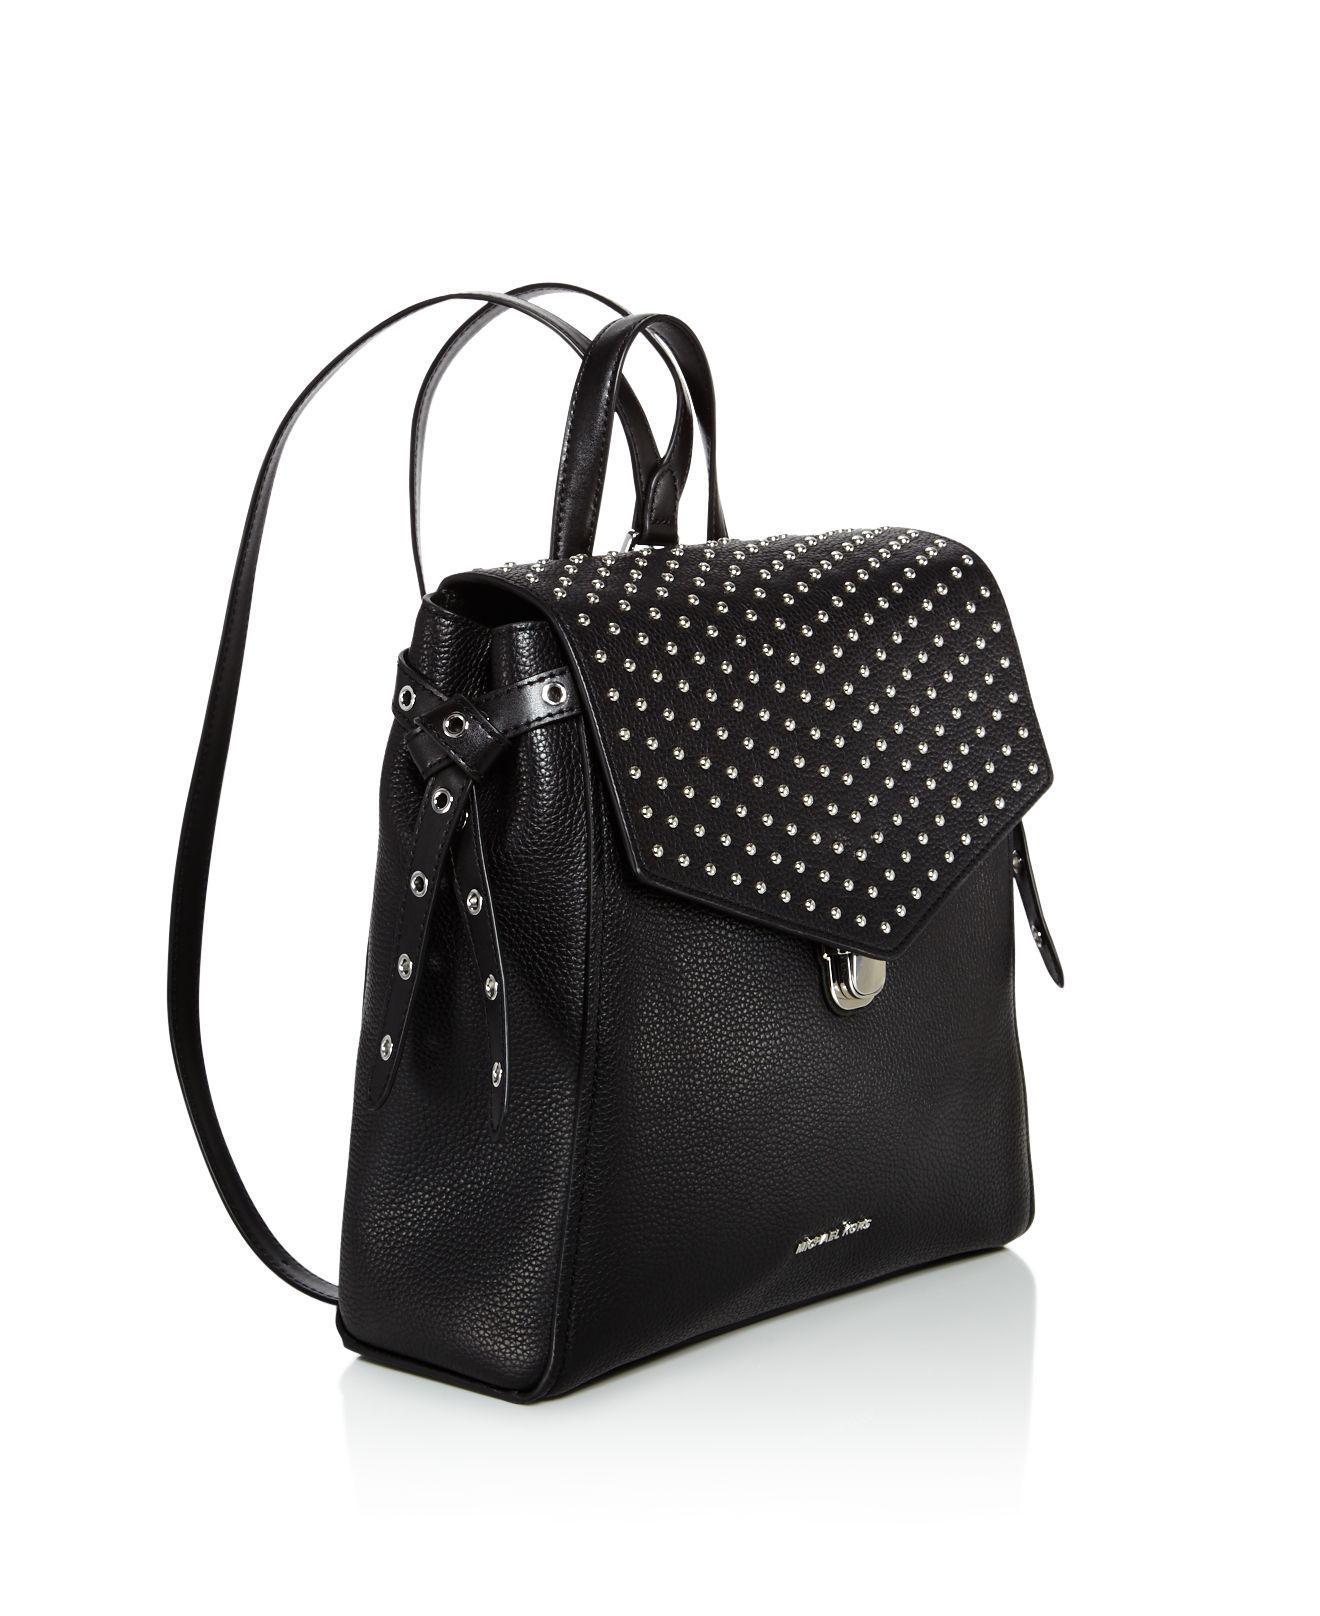 Michael Kors Bristol Medium Studded Leather Backpack in Black/Silver (Black)